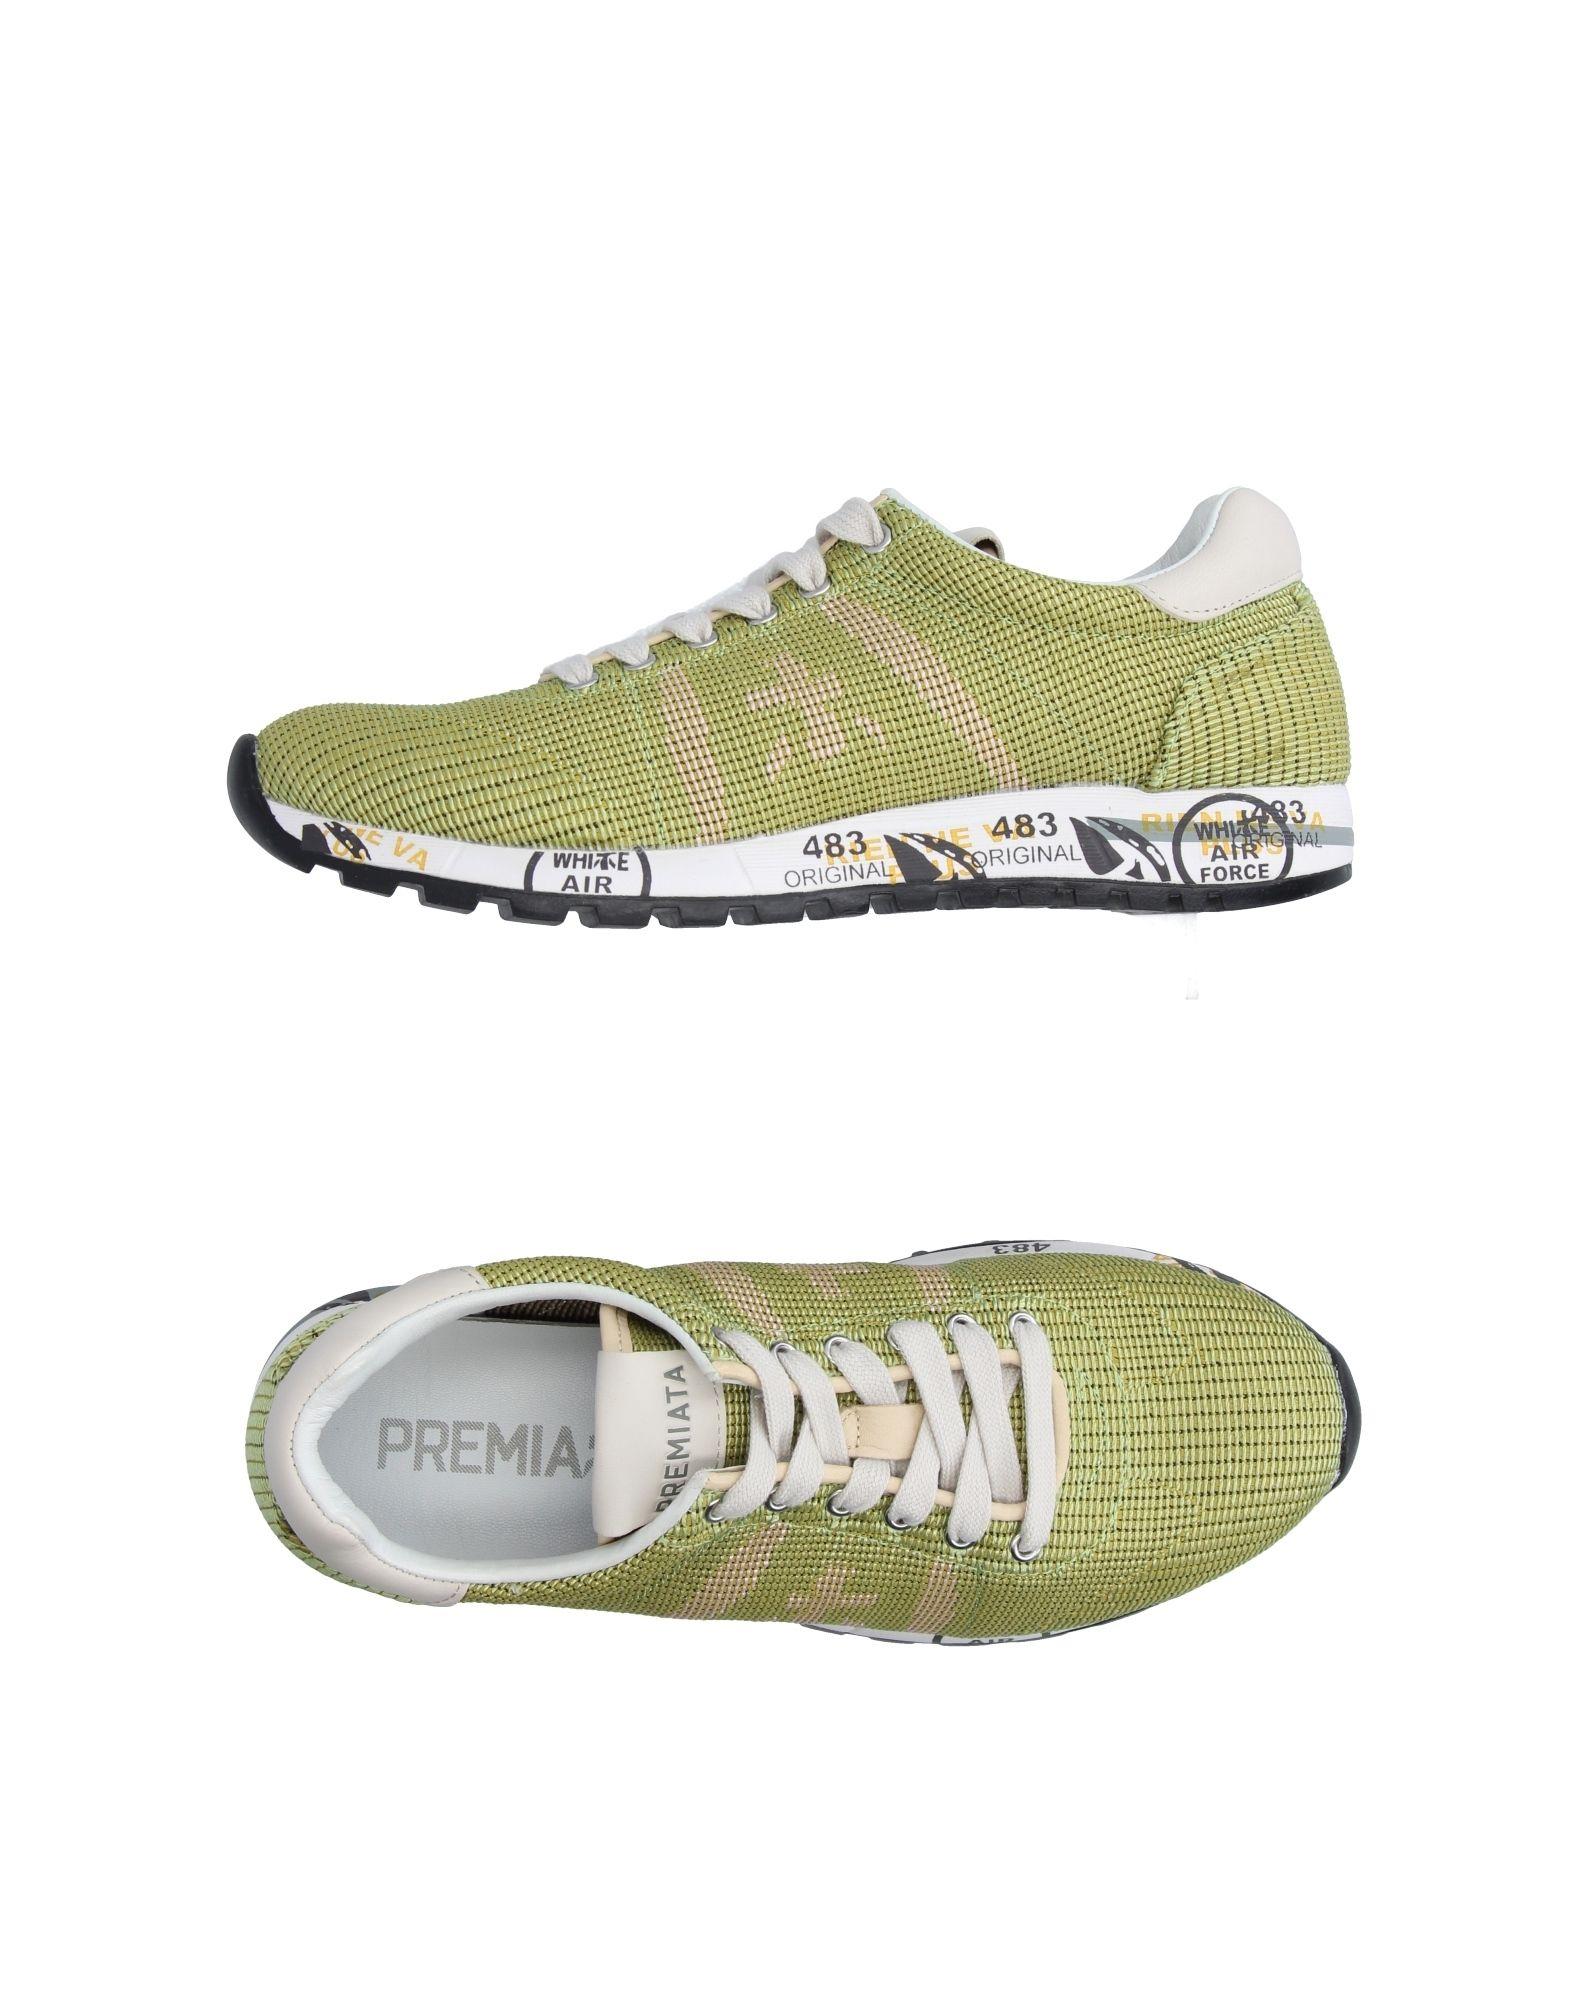 0aee4de3759 PREMIATA ΠΑΠΟΥΤΣΙΑ Παπούτσια τένις χαμηλά, Γυναικεία παπούτσια ...